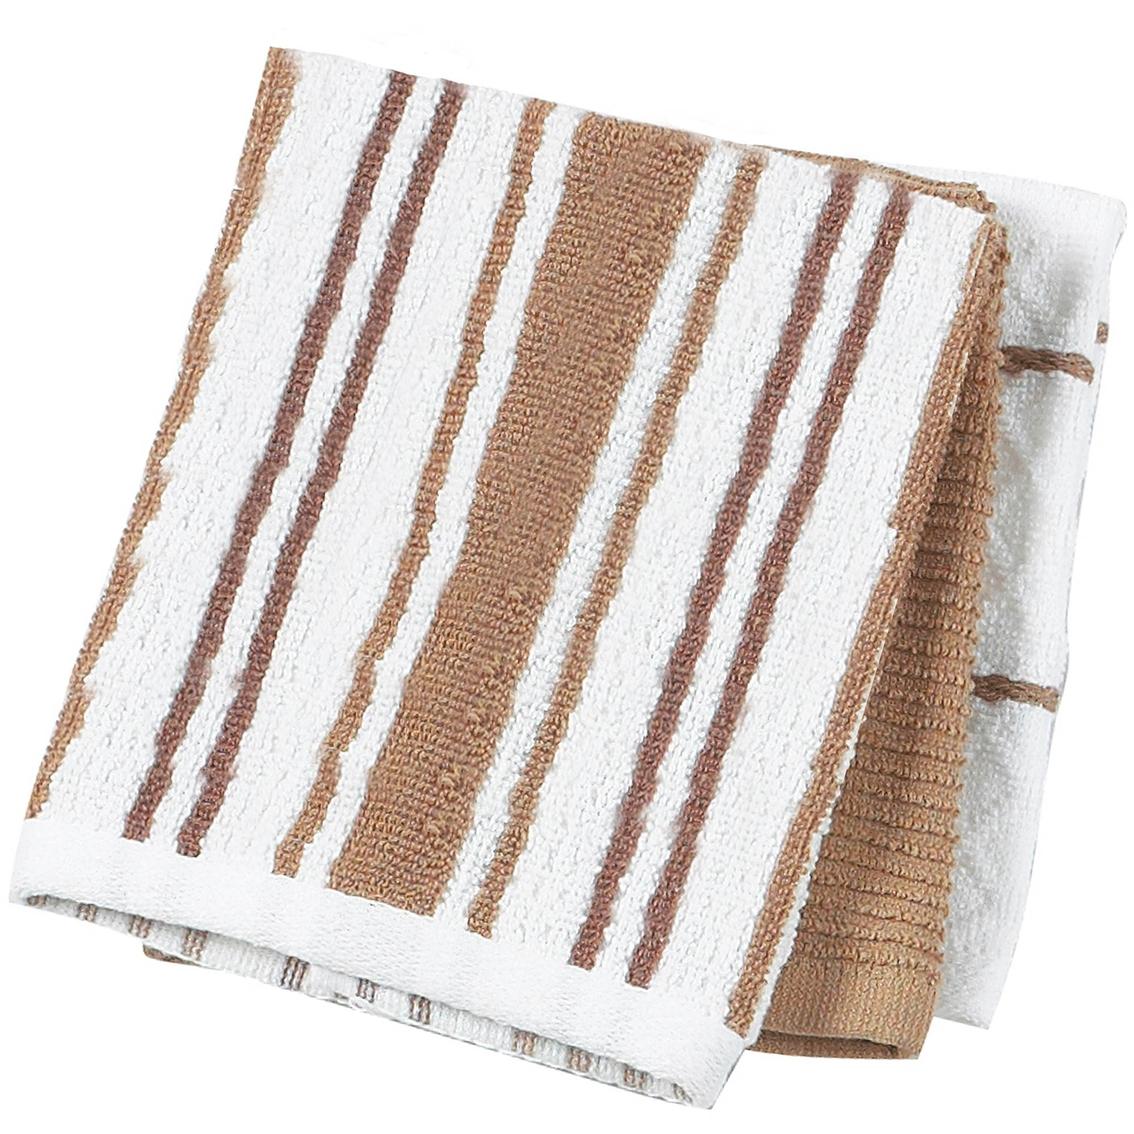 kay dee designs cafe express dish cloths 3 pc set table linens mats home appliances. Black Bedroom Furniture Sets. Home Design Ideas